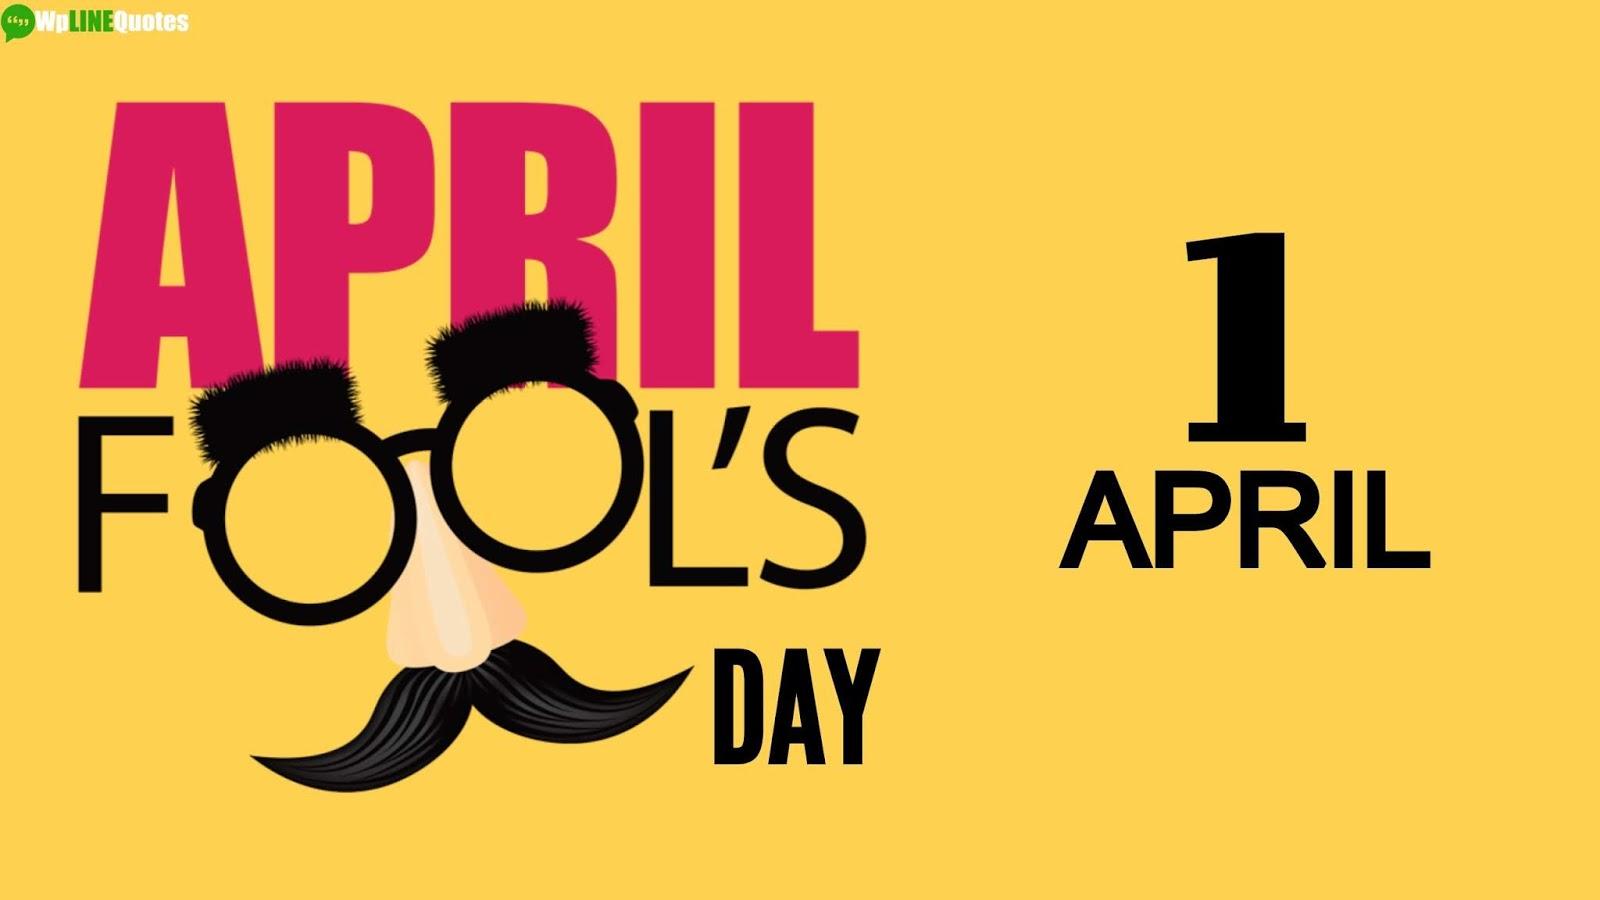 (Latest) April Fools Day Jokes